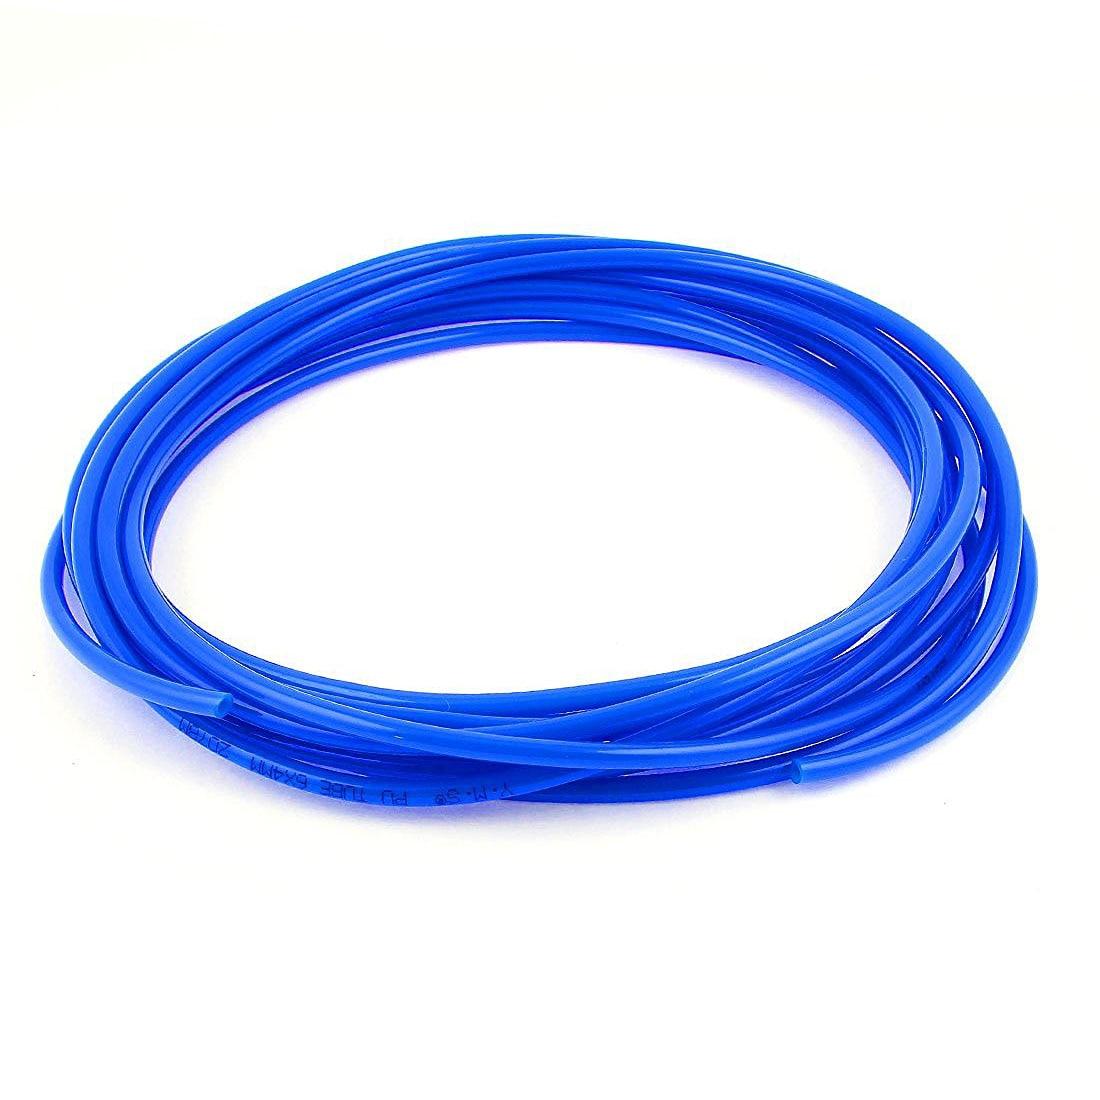 Polyurethane PU Air Compressor Hose Tube 7 Meter 6mm x 4mm Royal Blue